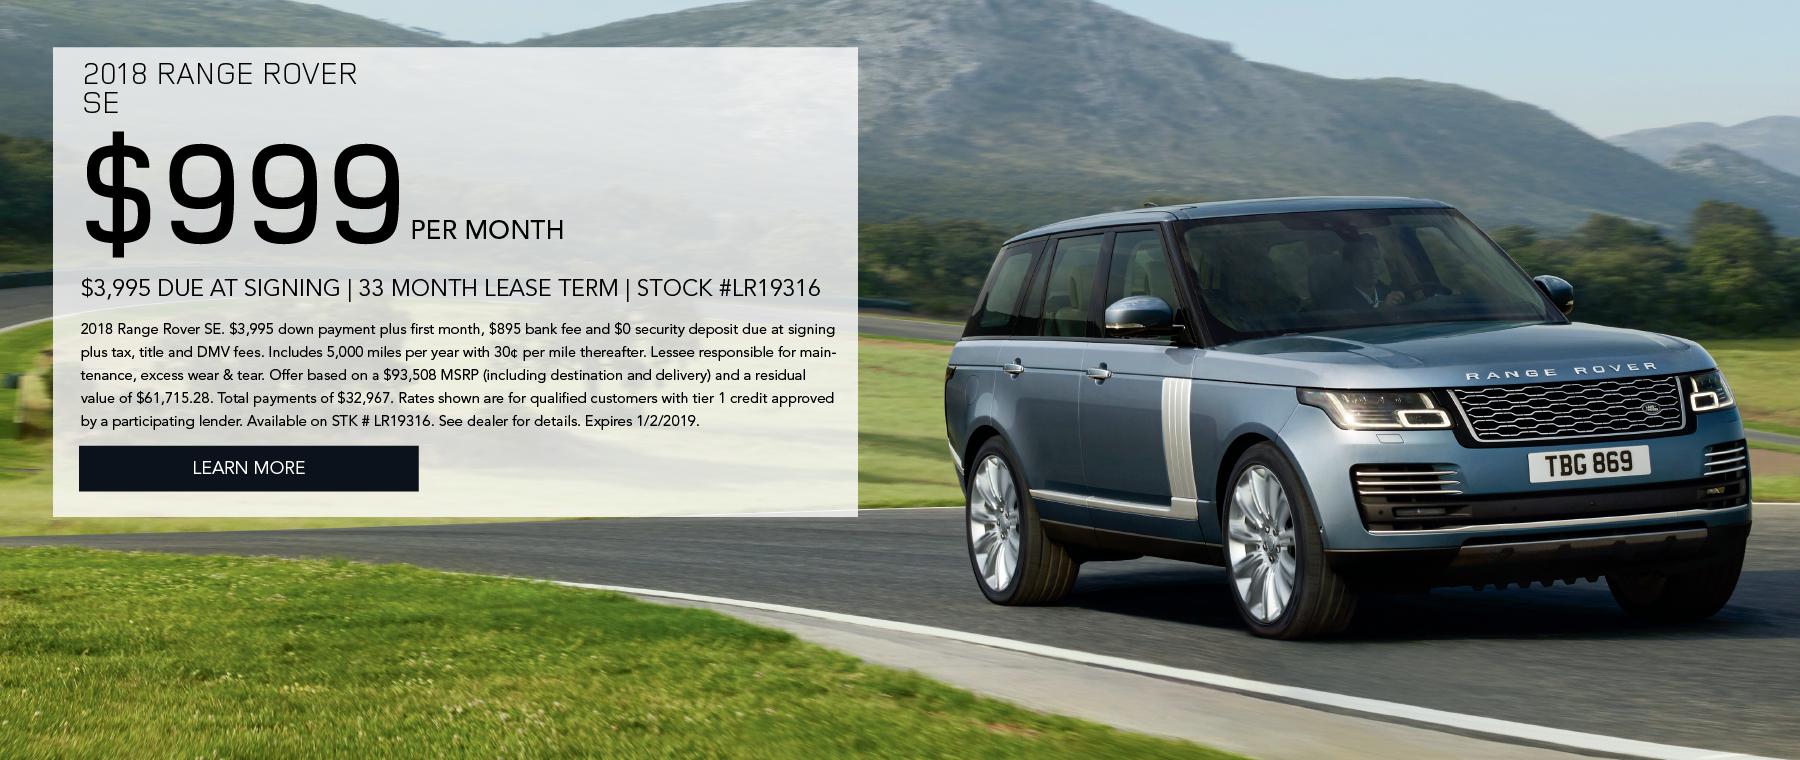 Manhattan Land Rover >> Land Rover Manhattan Land Rover Dealer In Nyc